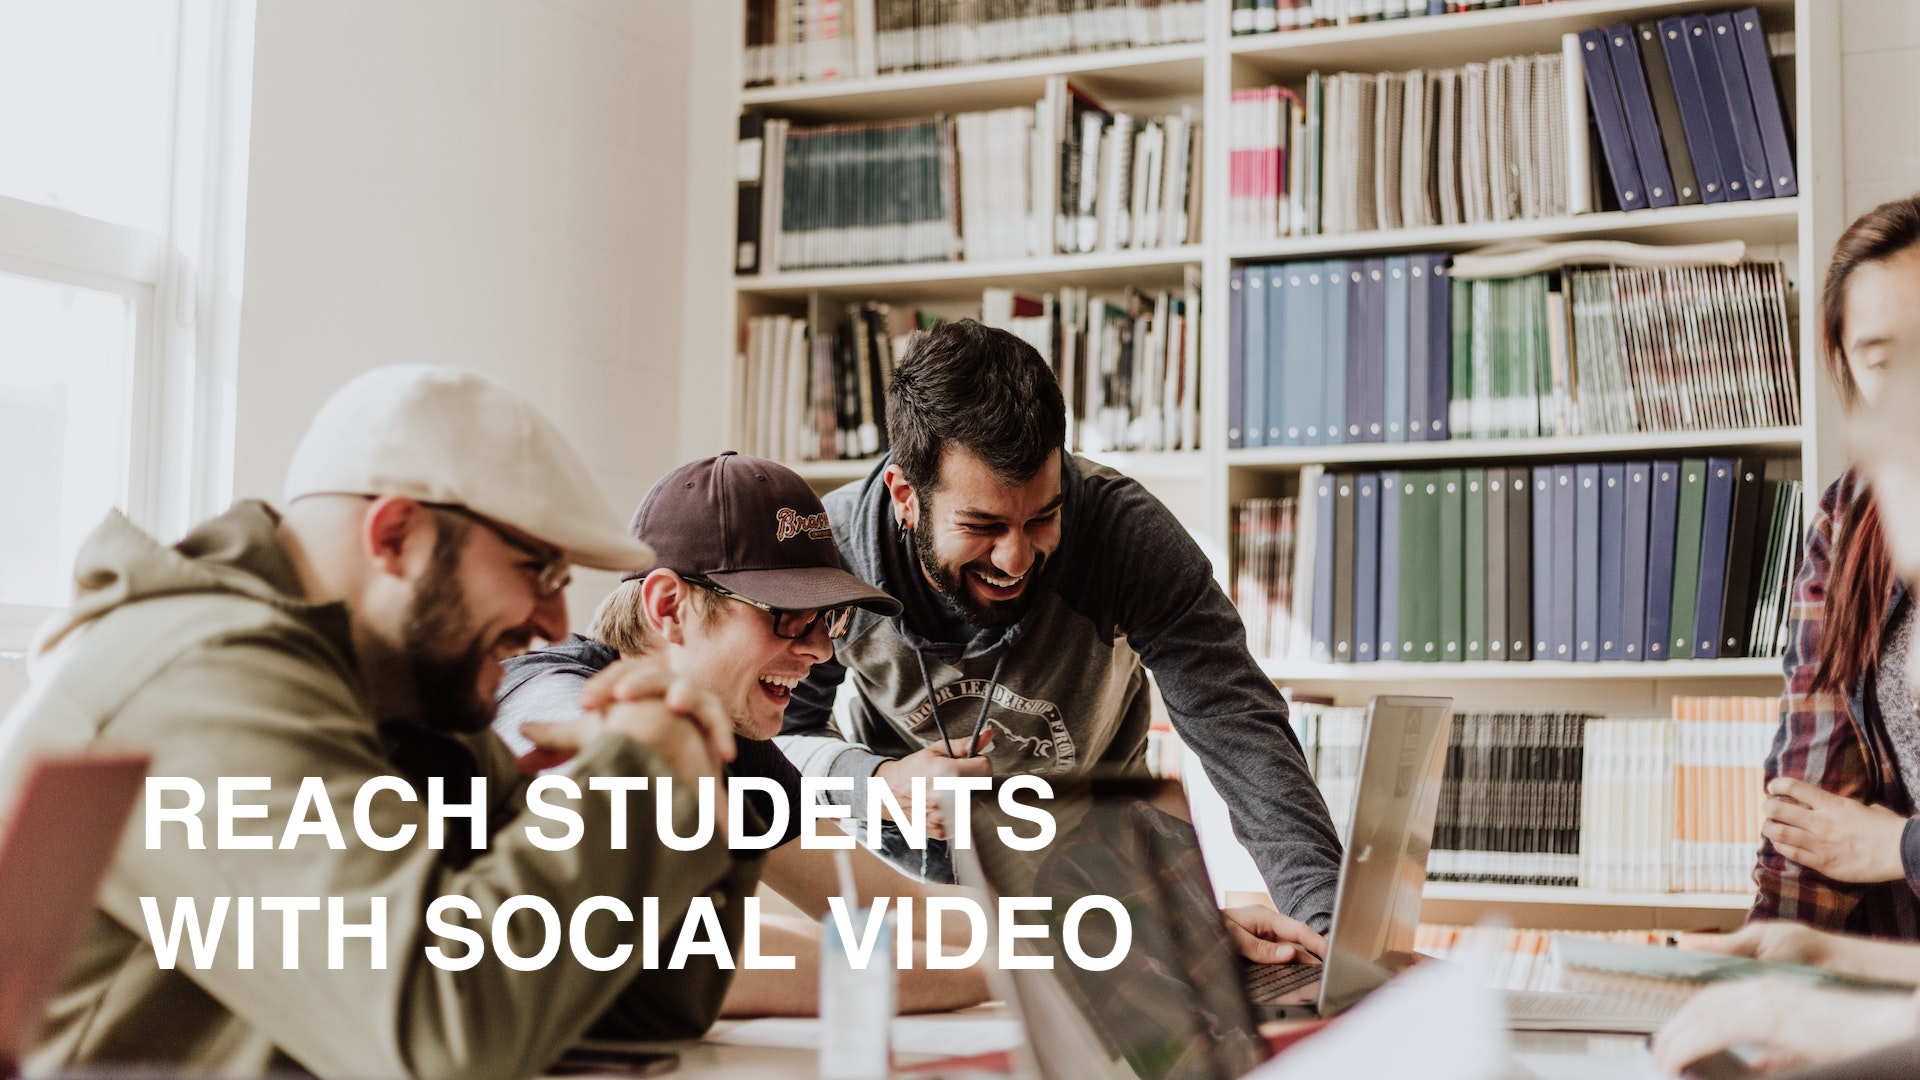 SOCIAL MEDIA VIDEO IN EDUCATION